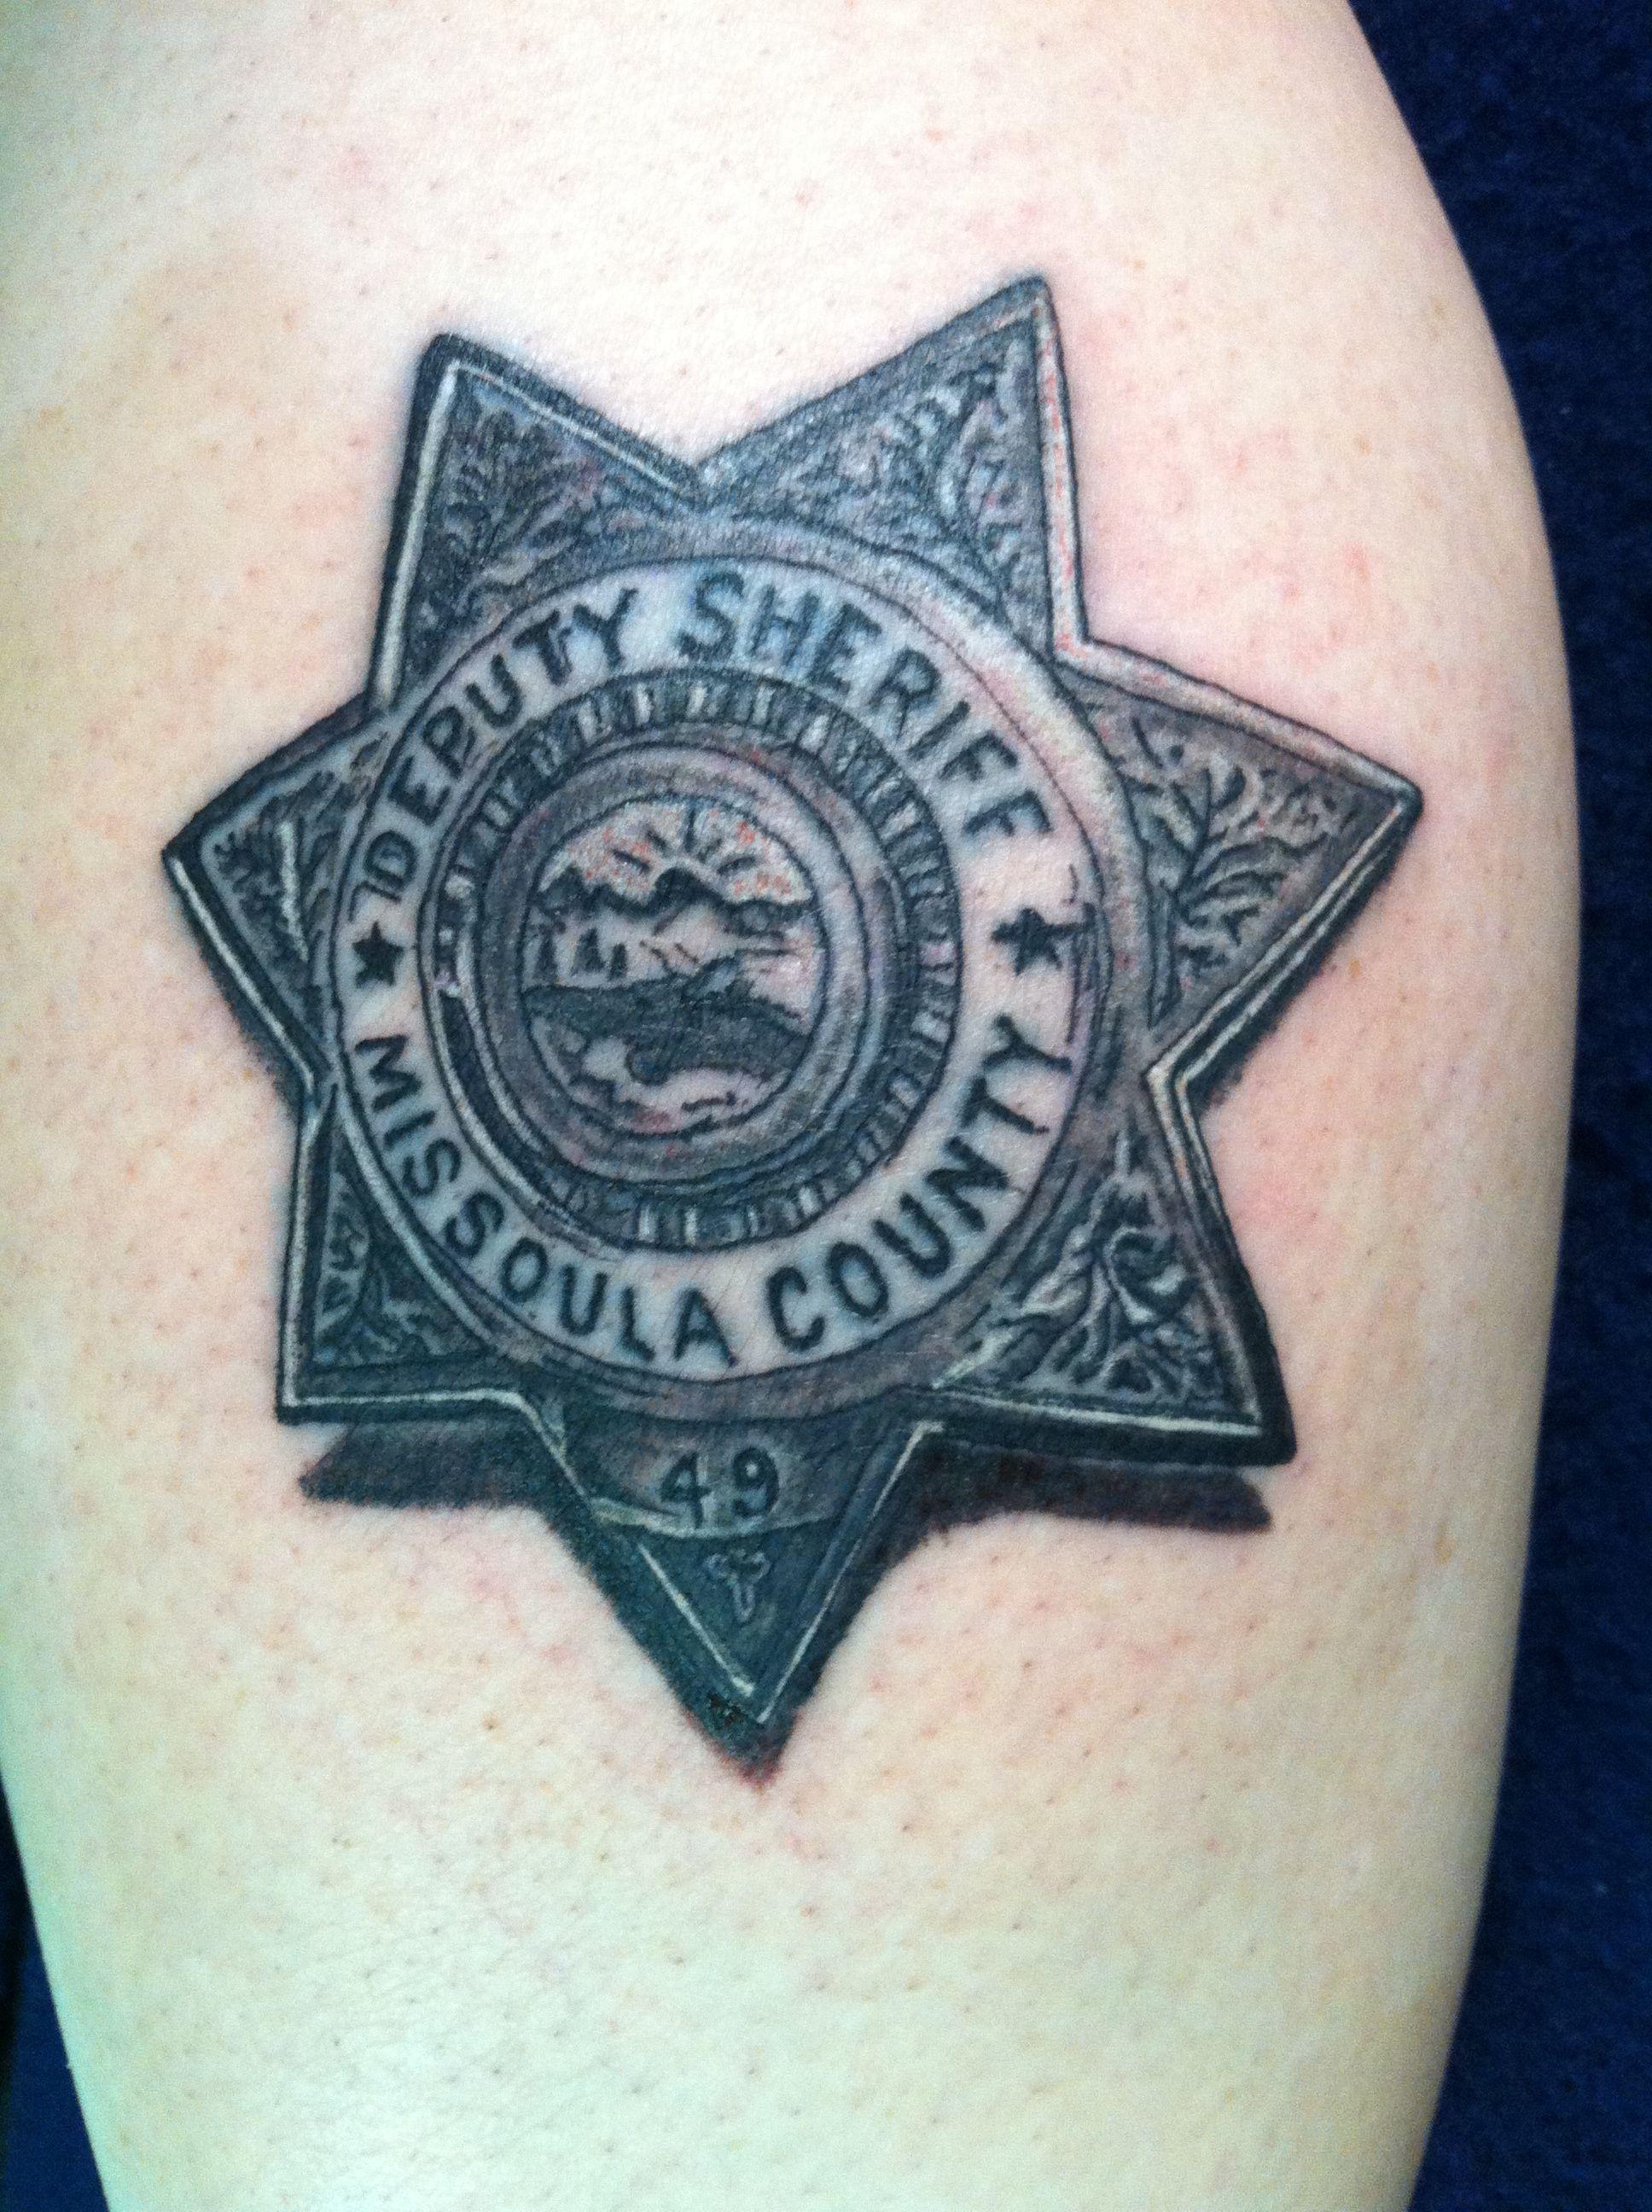 Police badge memorial by matt kimery stay true tattoo studio police badge memorial by matt kimery stay true tattoo studio biocorpaavc Gallery